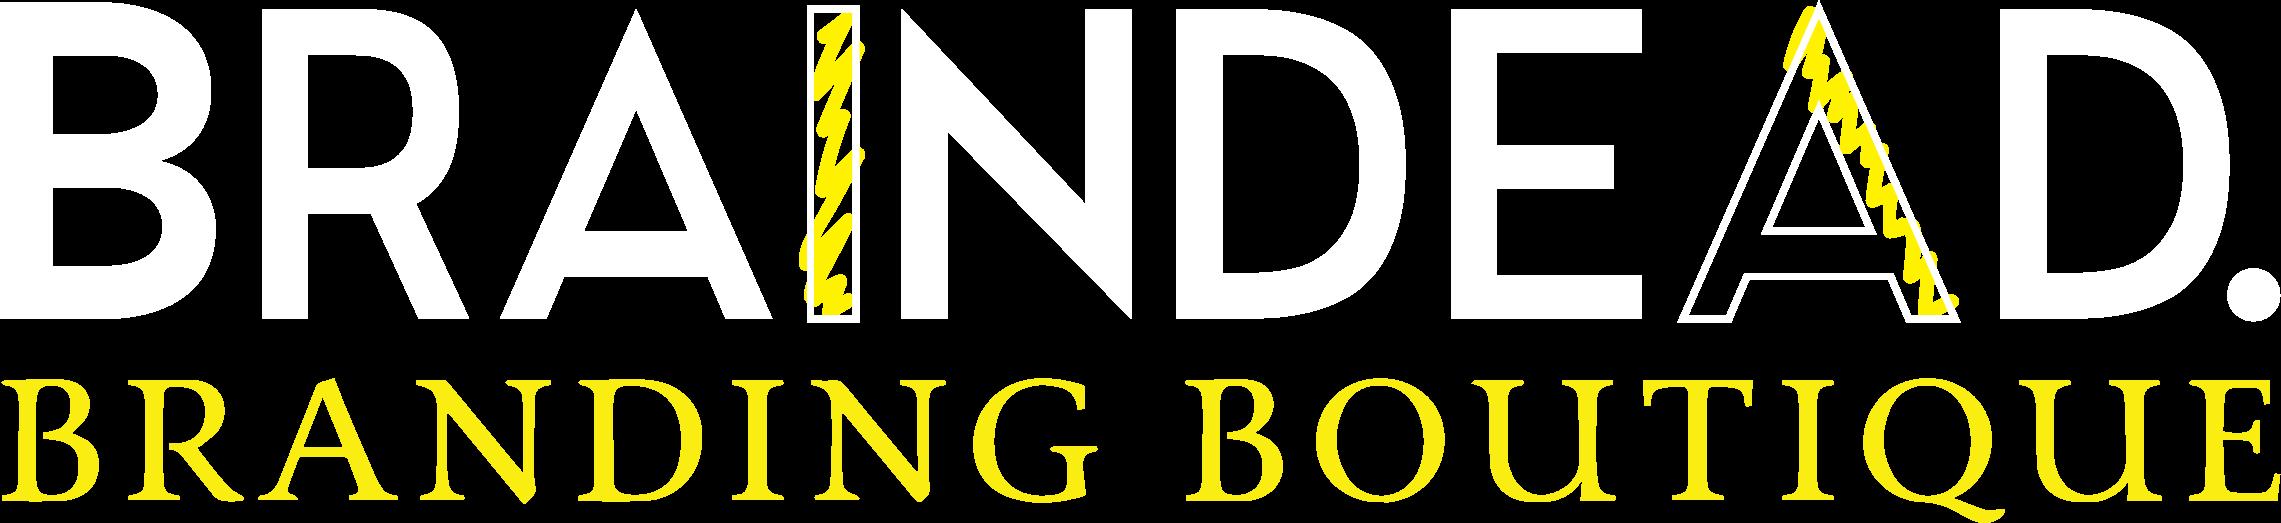 Braindead Branding